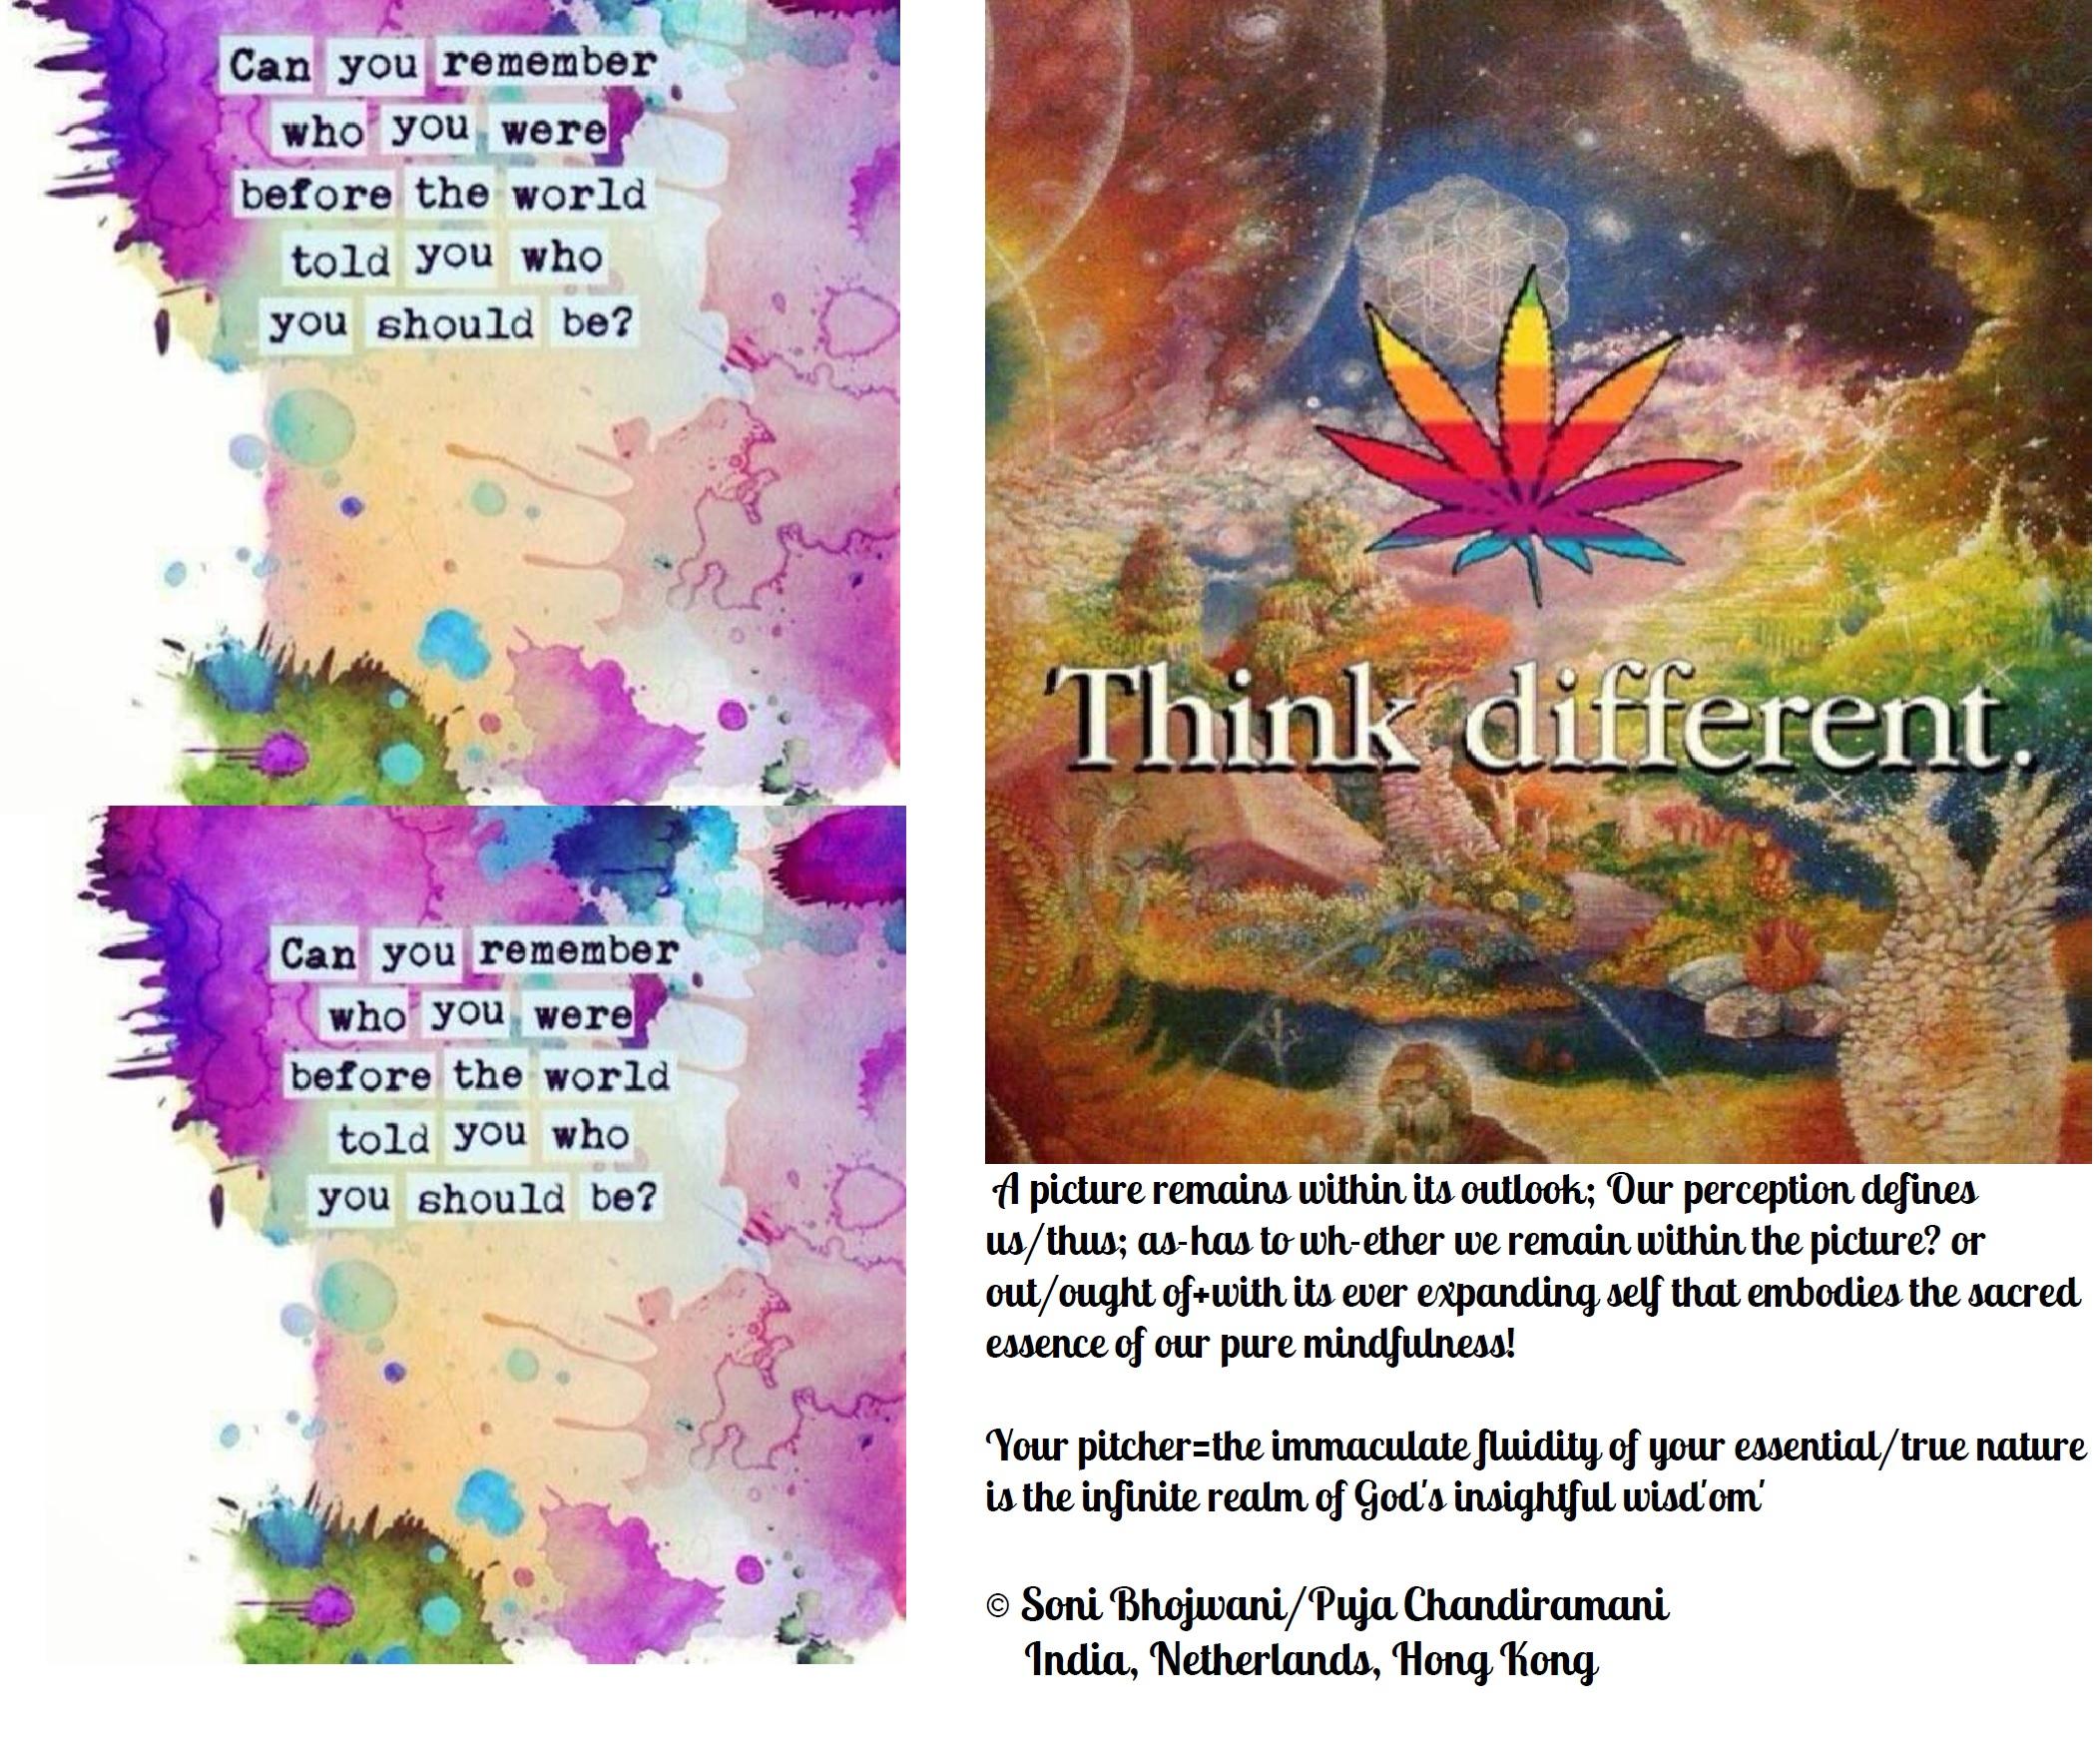 https://i0.wp.com/shivashaktibhava.files.wordpress.com/2018/04/pure-mindfulness-sona-puja.jpg?ssl=1&w=450